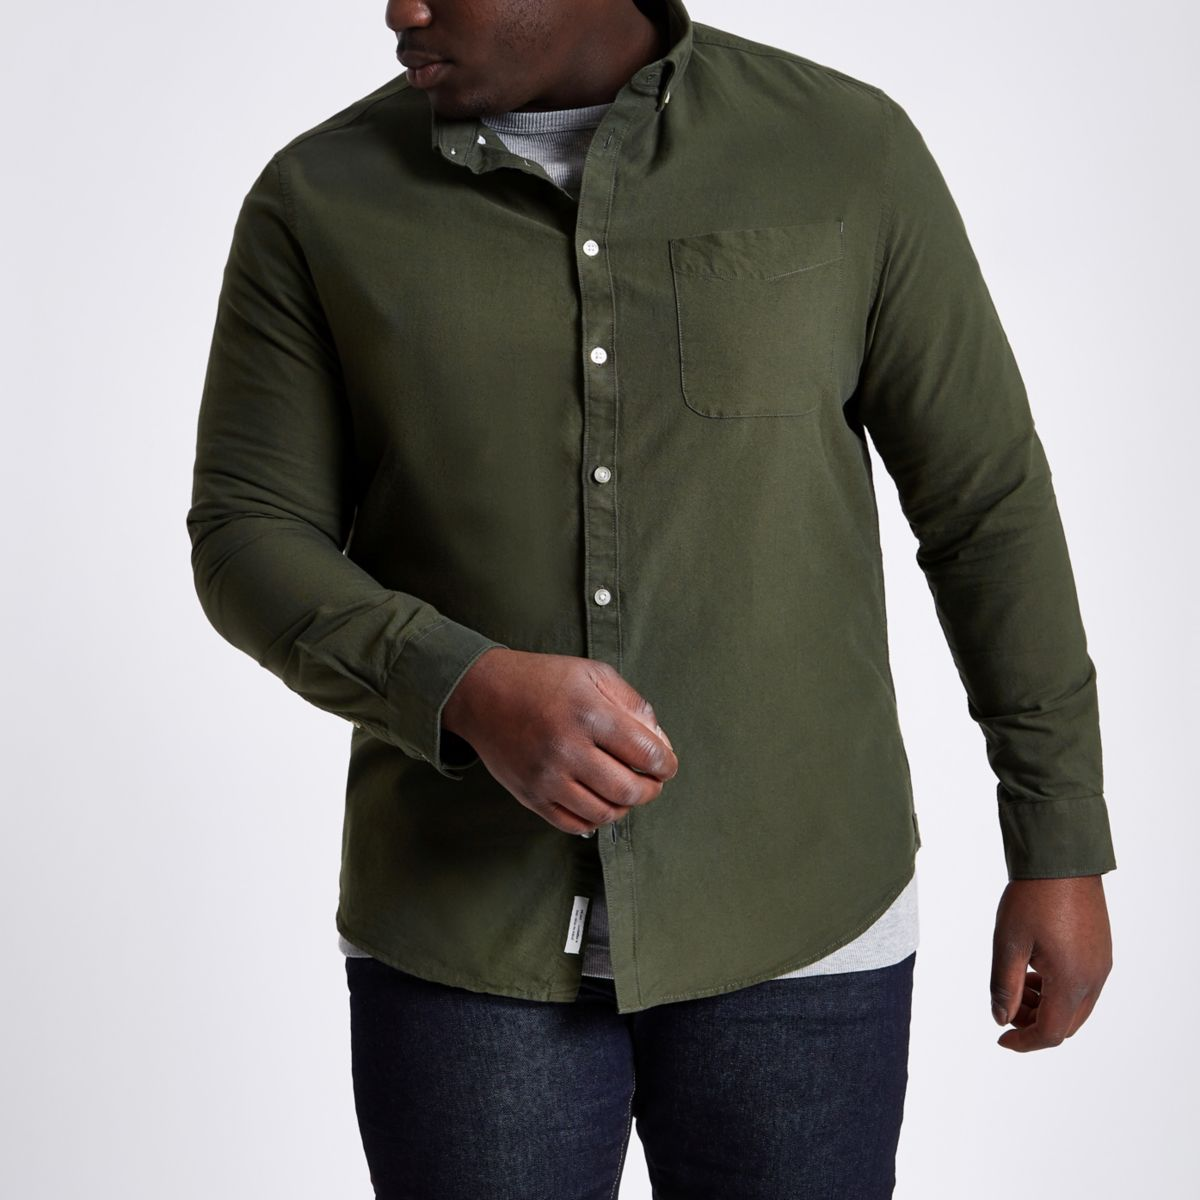 Big and Tall - Groen Oxford overhemd met knopen